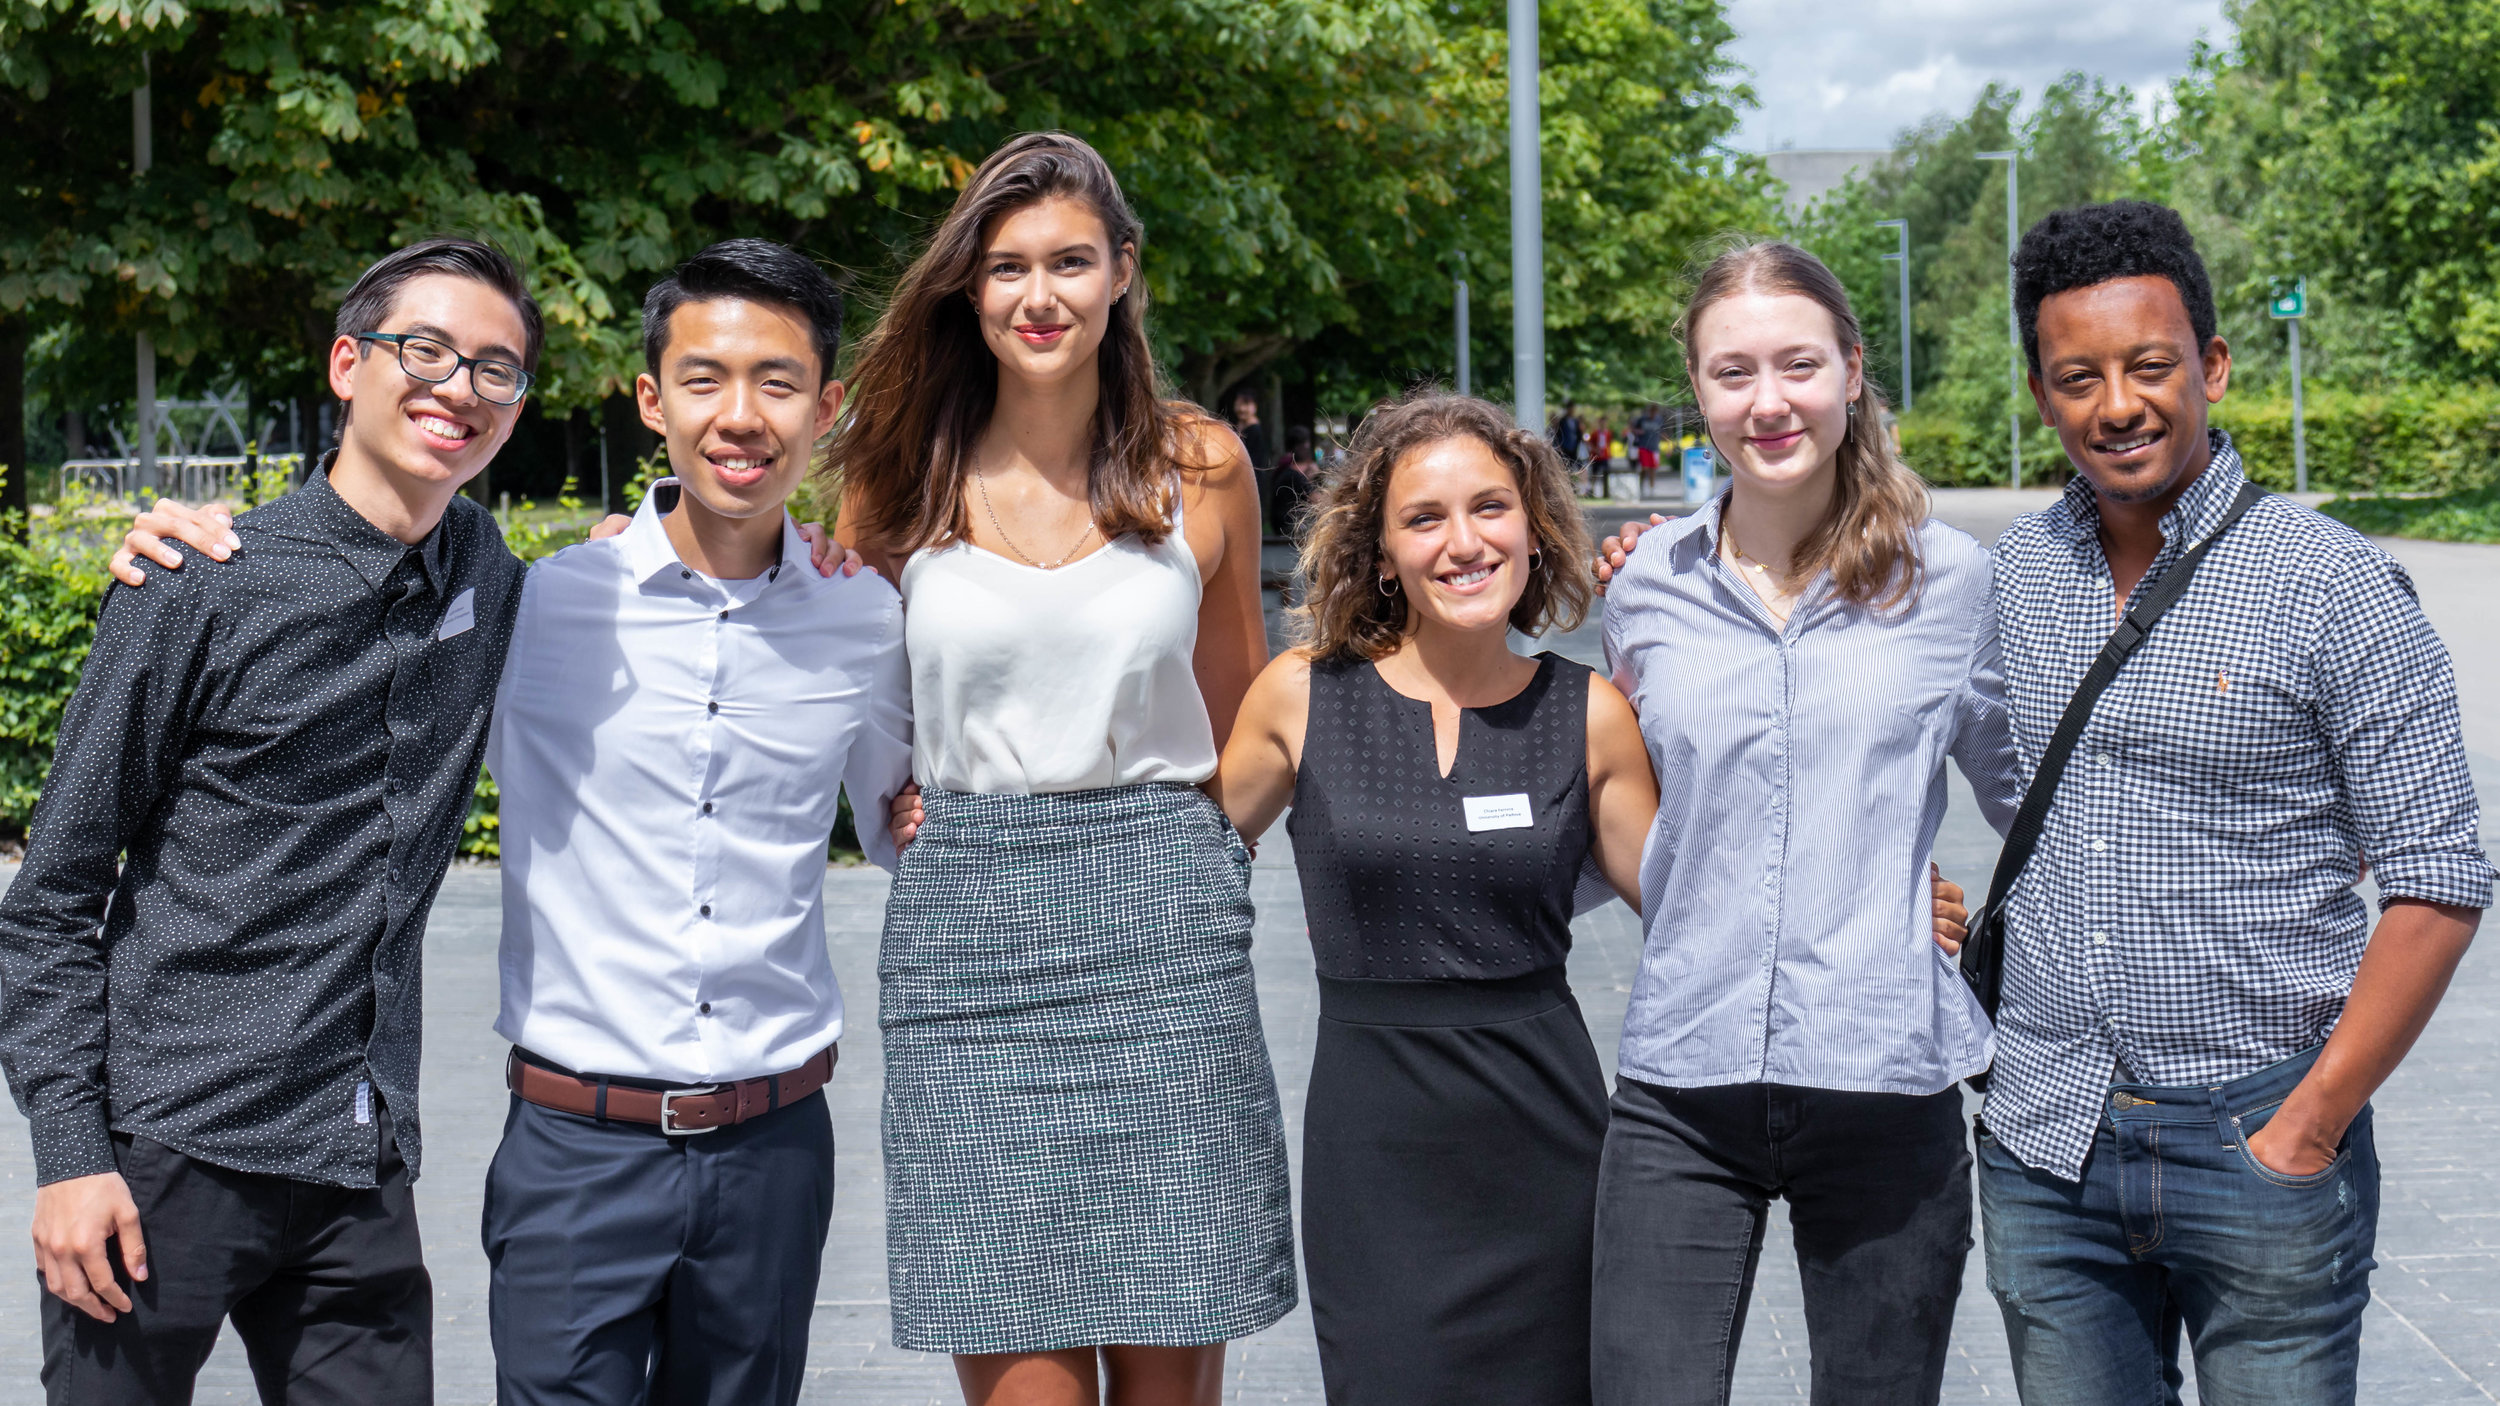 The winning team Ampai, Ampai! (Left to right: Guilly, Tuan Jun, Gabriela, Chiara, Eva and their staff advisor Solomon)